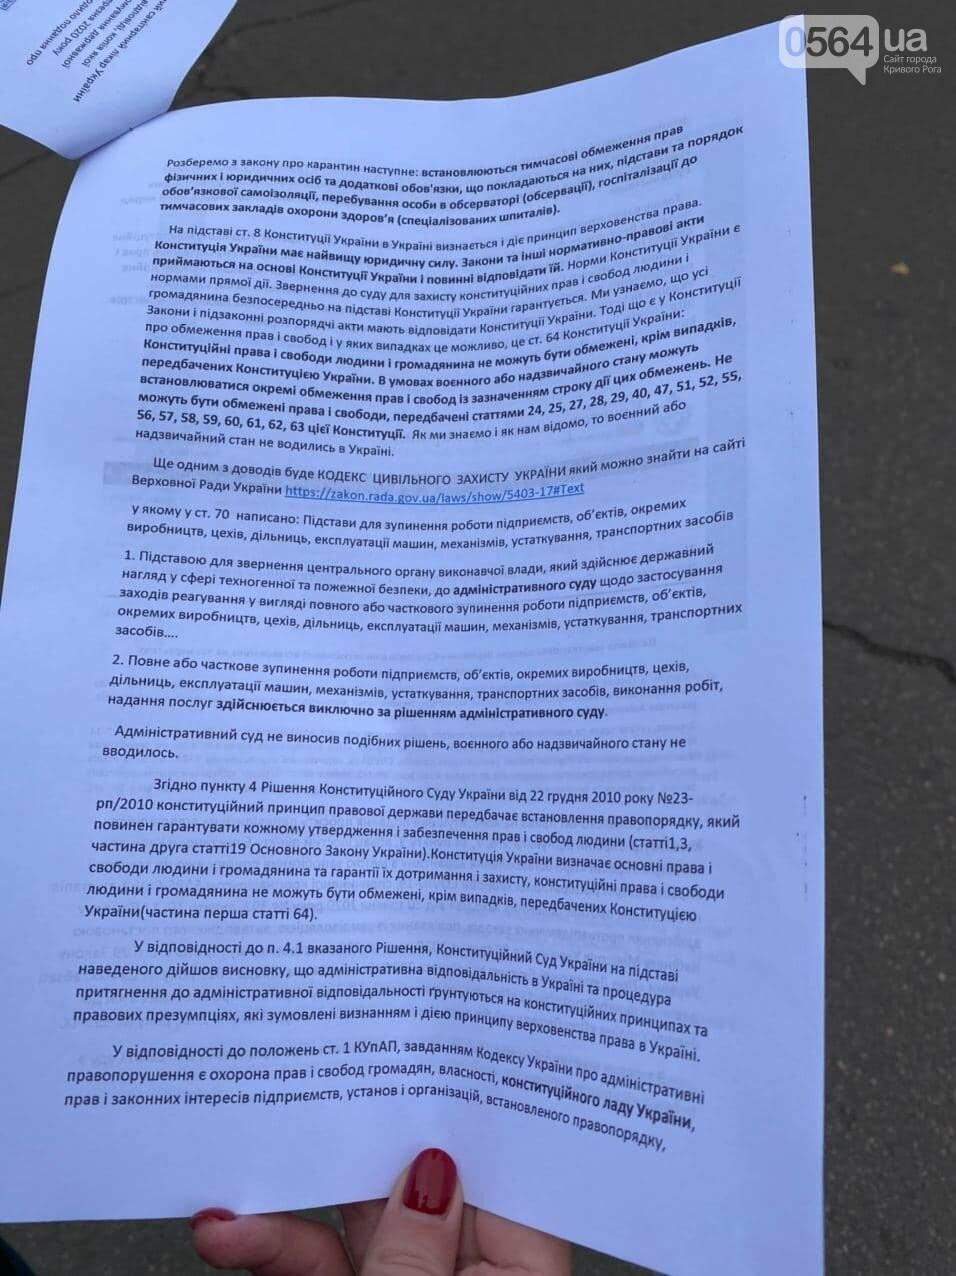 Представители малого бизнеса продолжили протест возле мэрии Кривого Рога, - ФОТО, ВИДЕО, фото-3